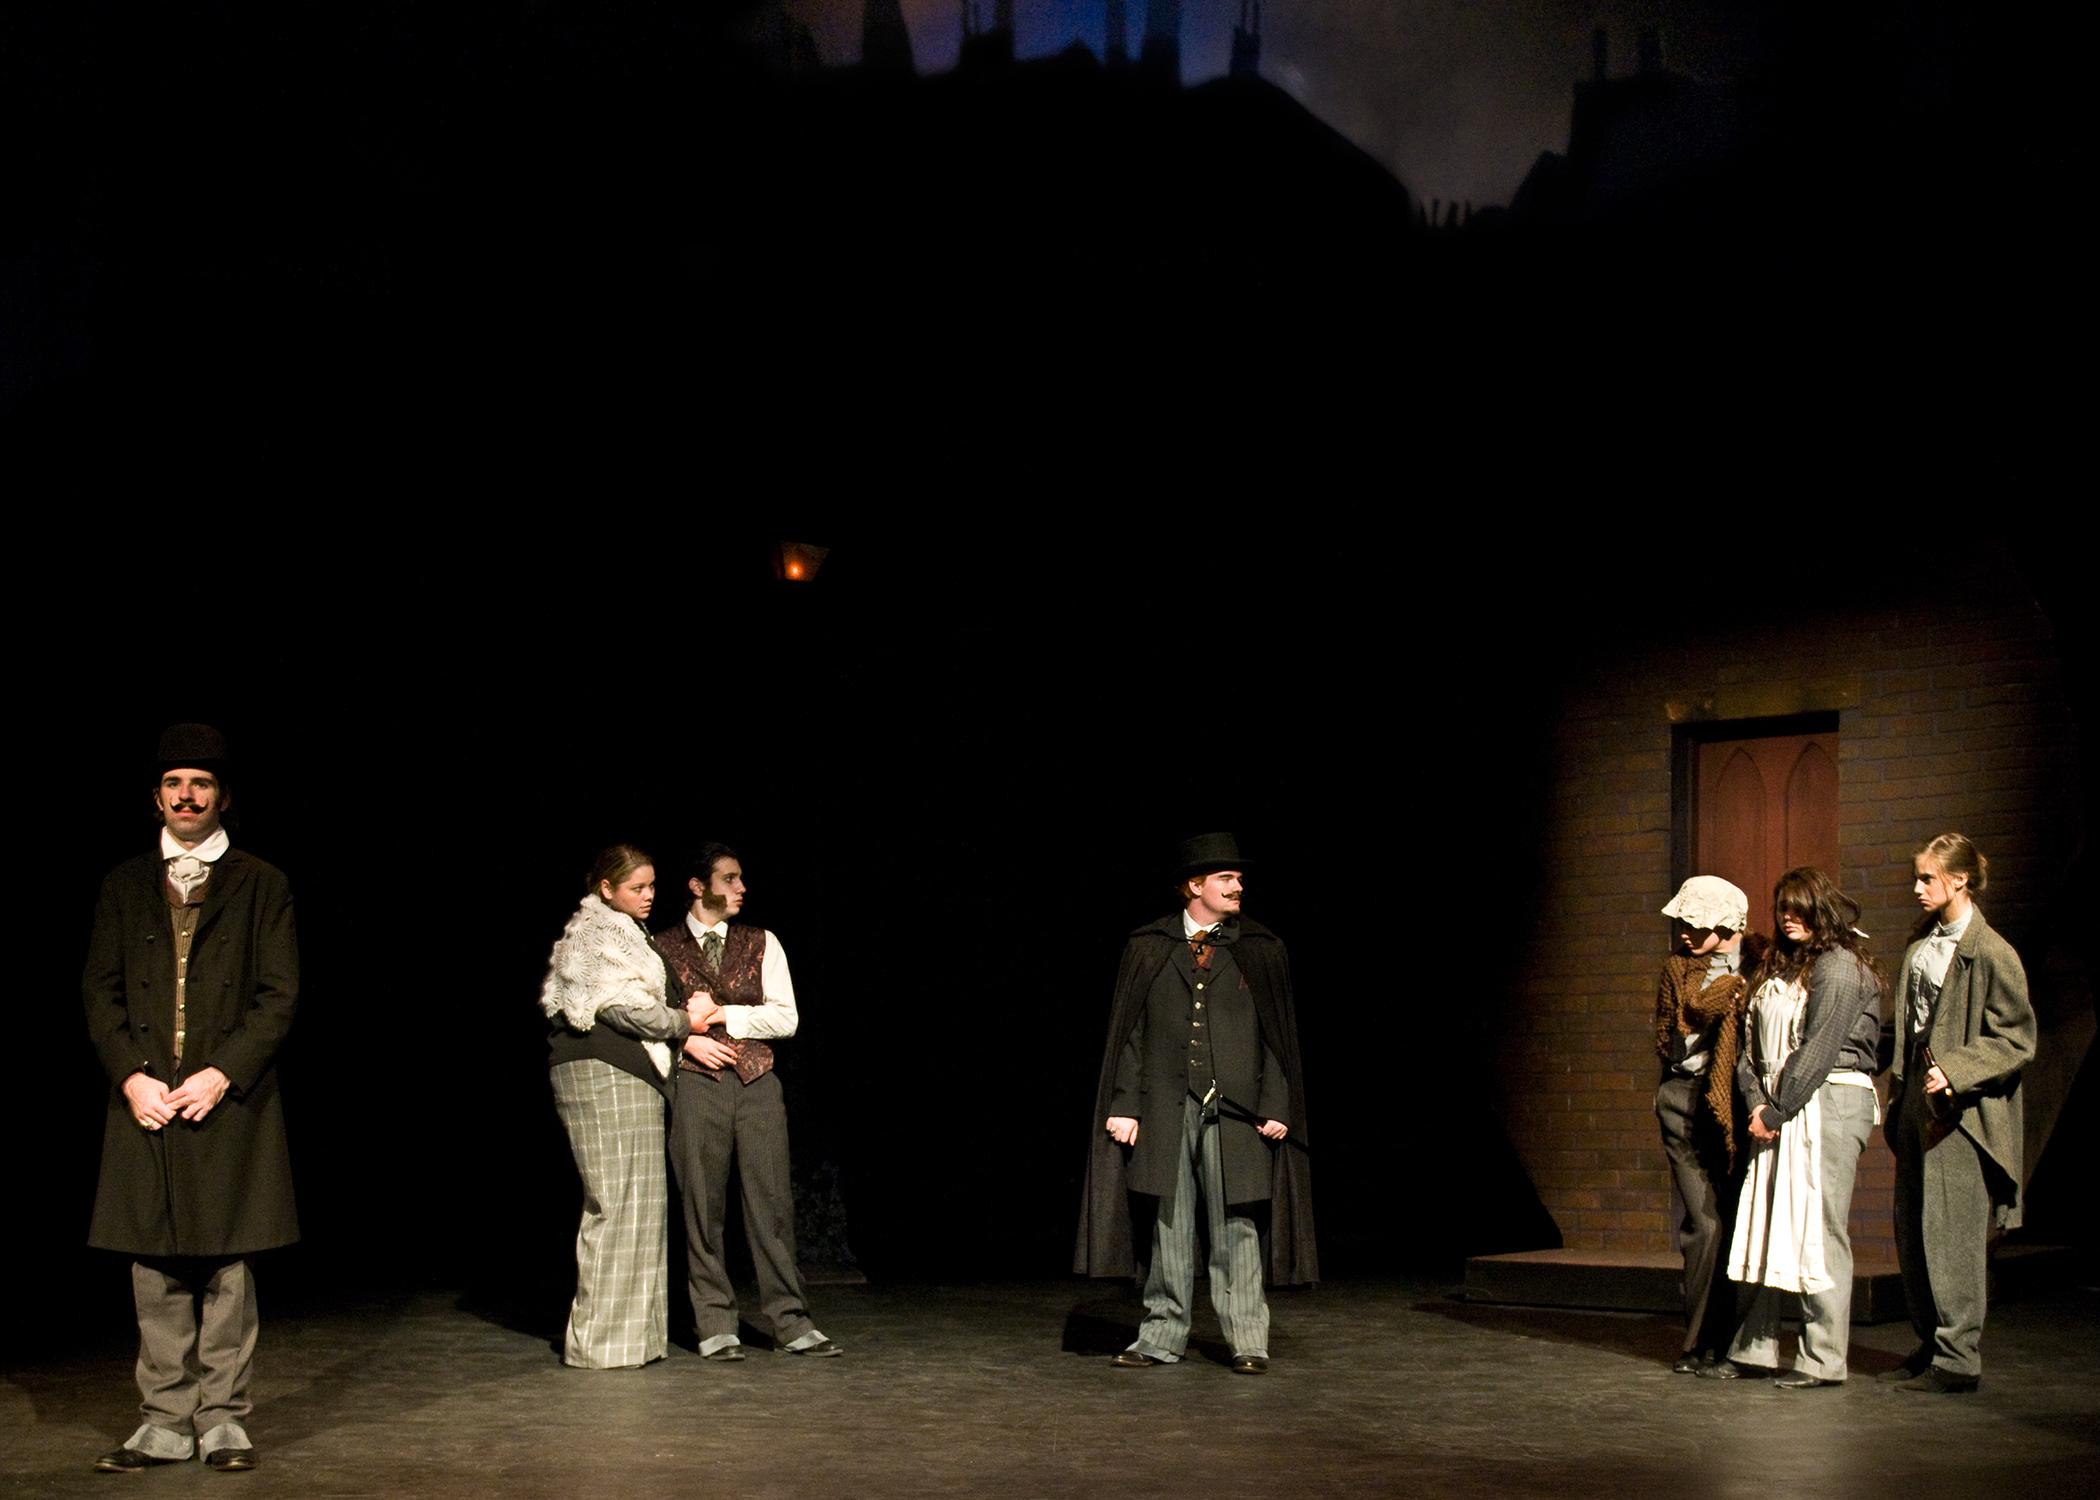 Jekyll and Hyde exterior scene.